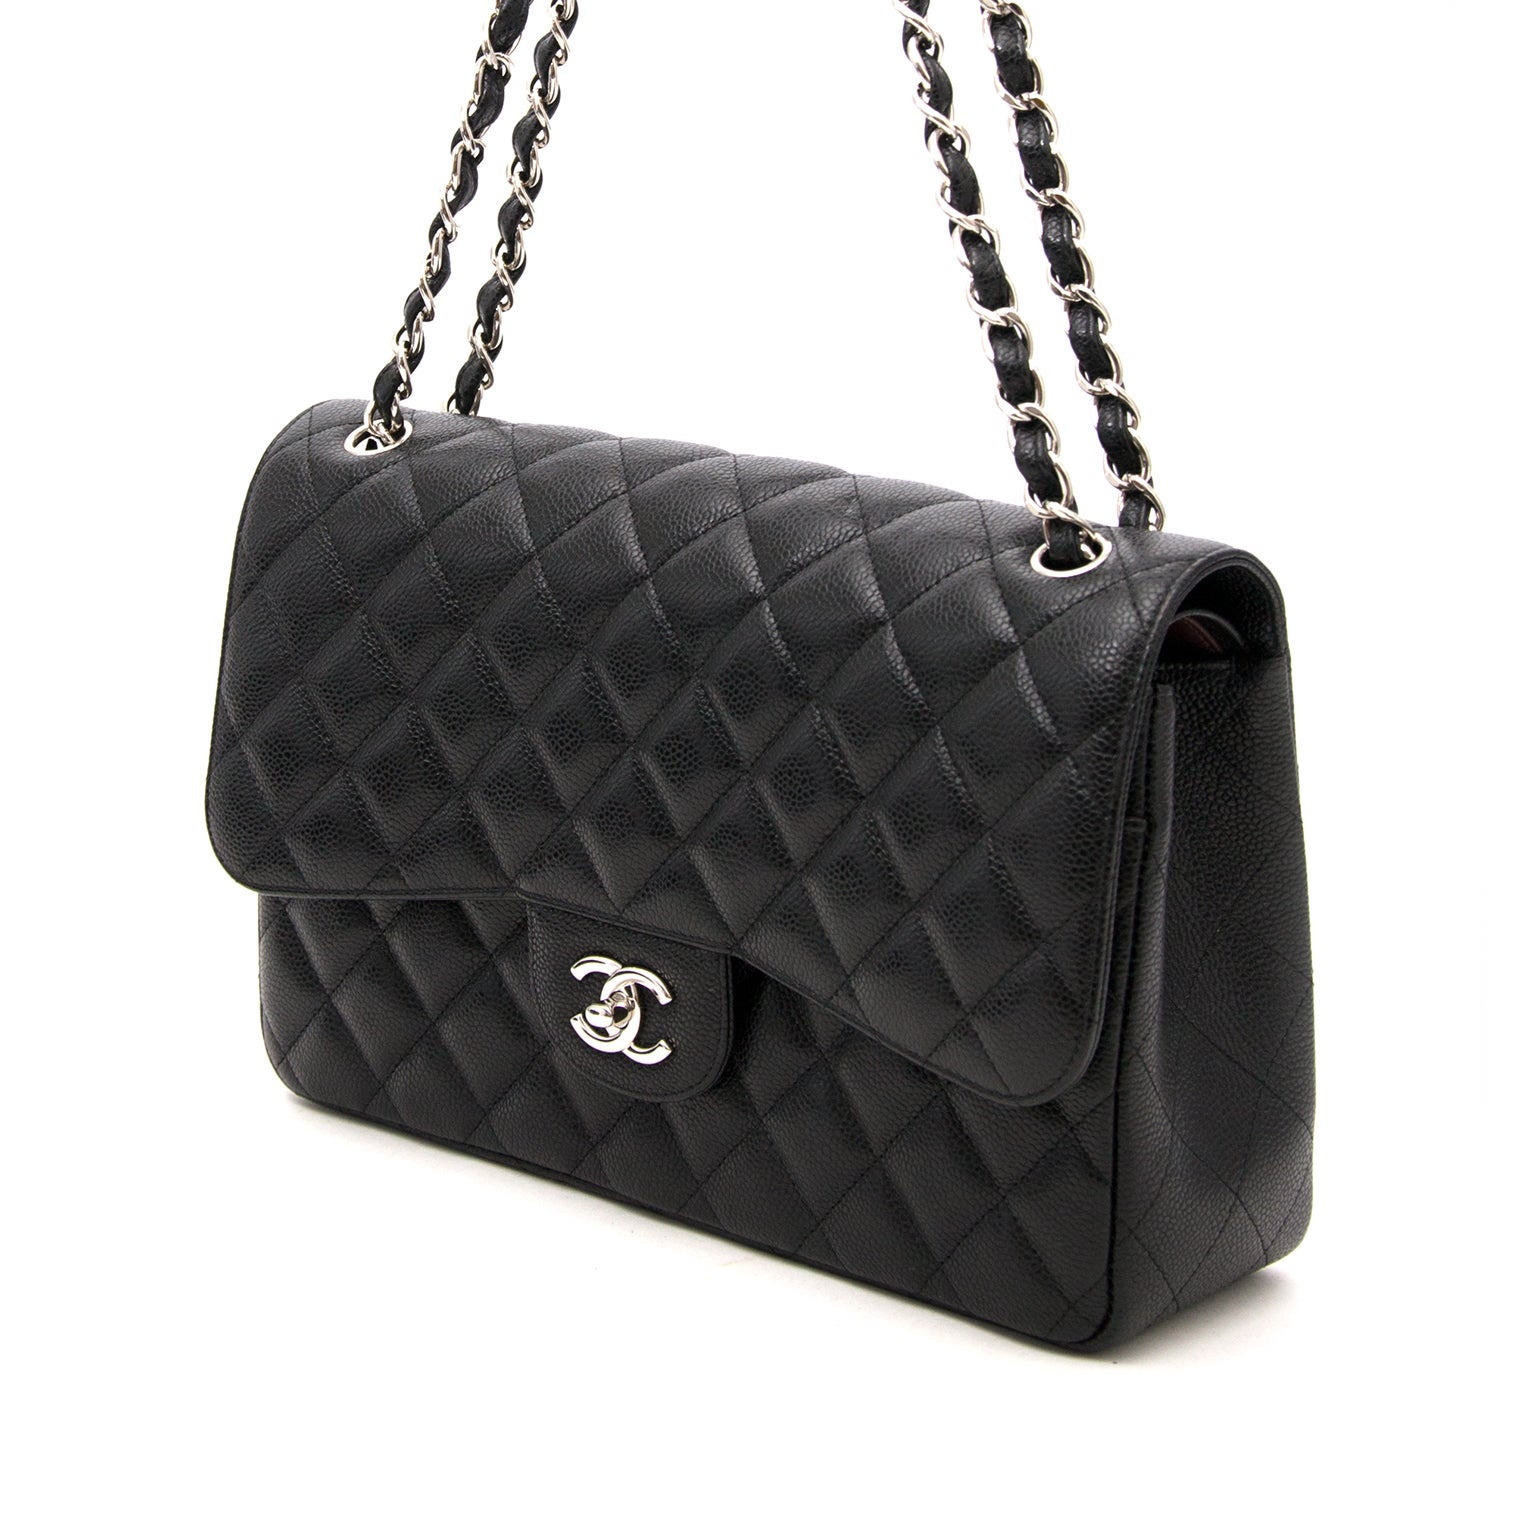 447d867a3036 Chanel Jumbo Classic Flap Bag at 1stdibs